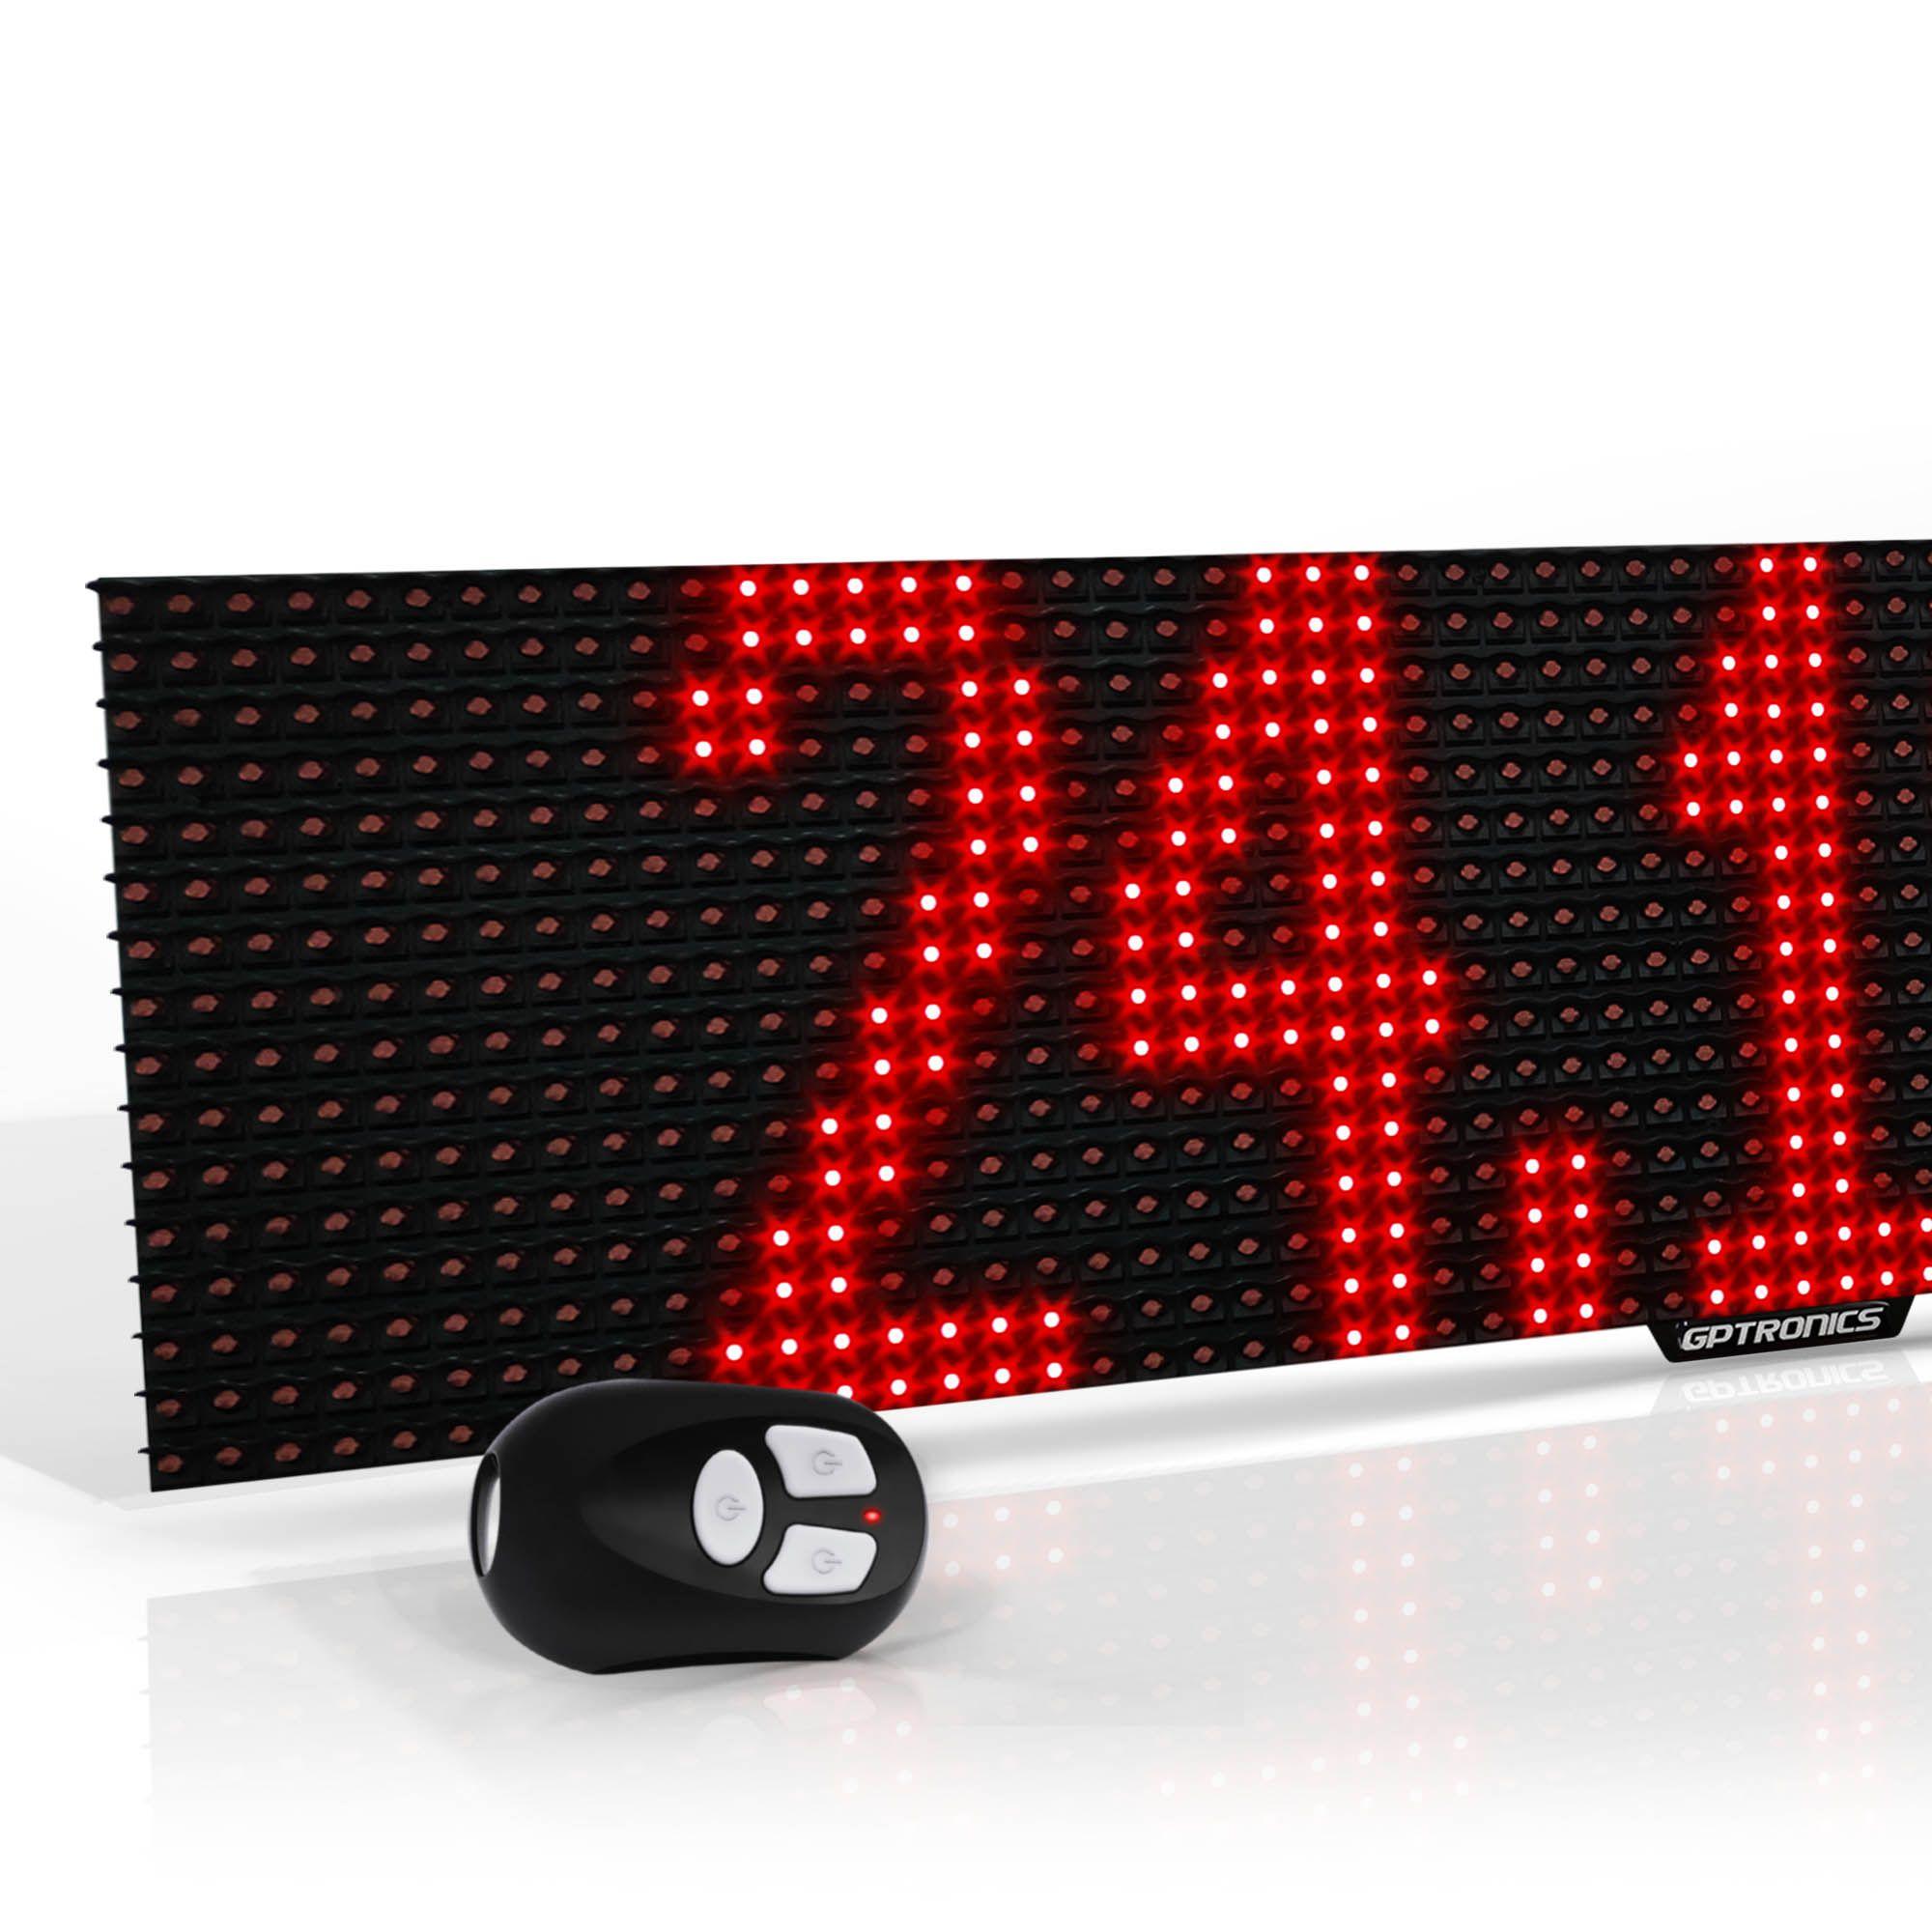 Painel de Mensagens LED Full M2E (Externo) - 64x16 cm